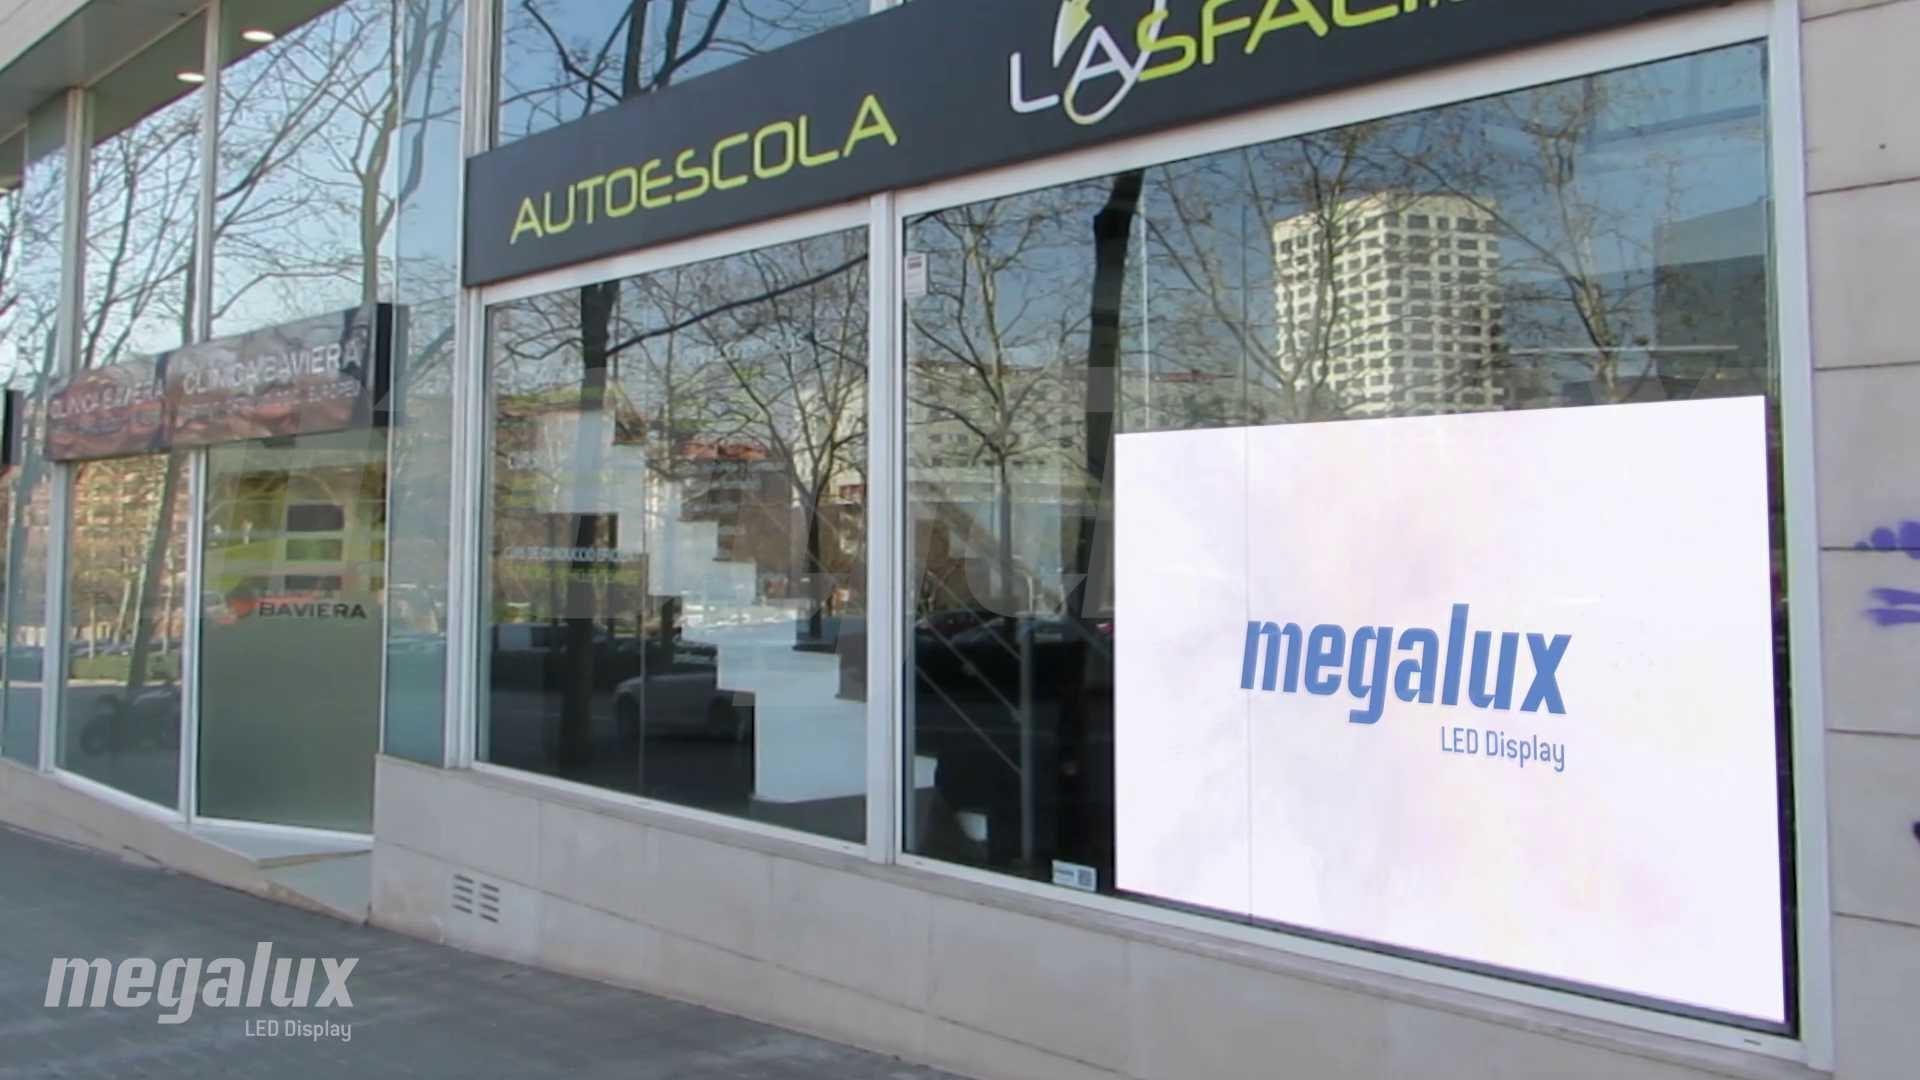 Pantalla LED Megalux en Sabadell, el sector de Autoescuelas coge fuerza con pantalla LED